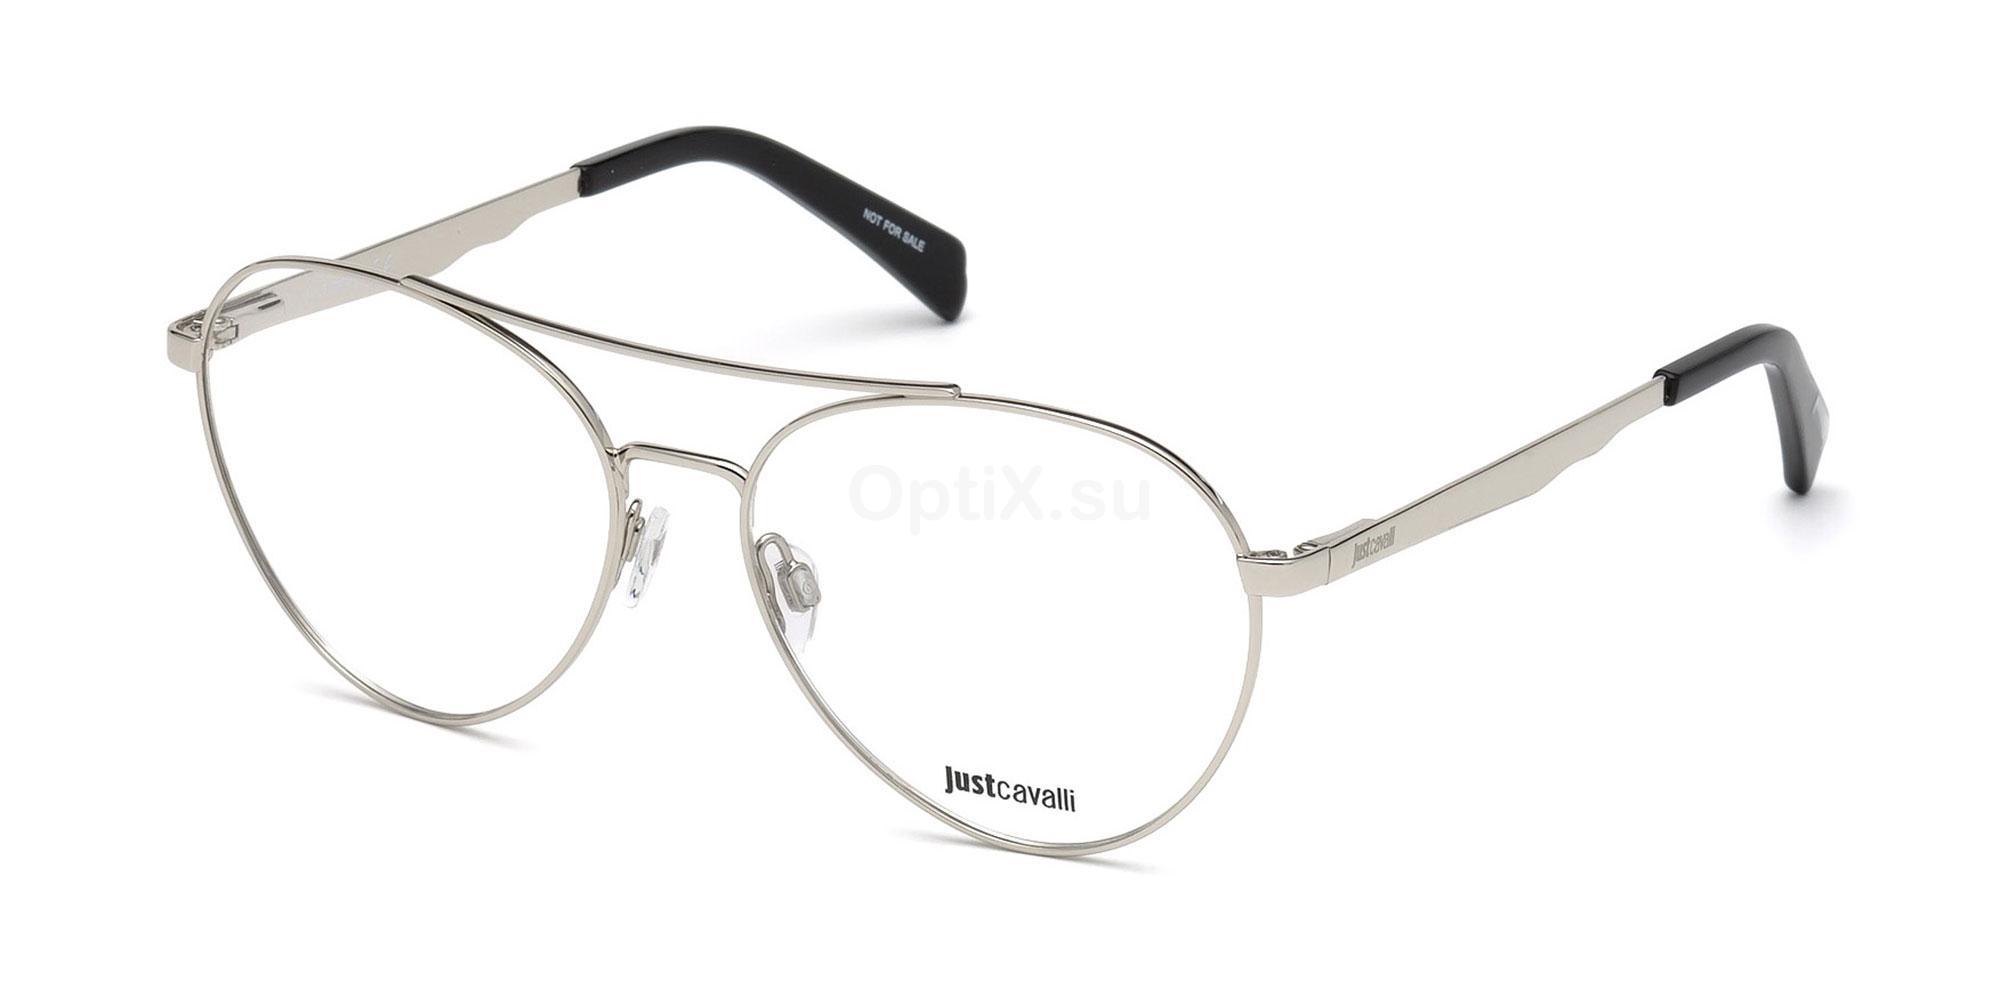 016 JC0855 Glasses, Just Cavalli